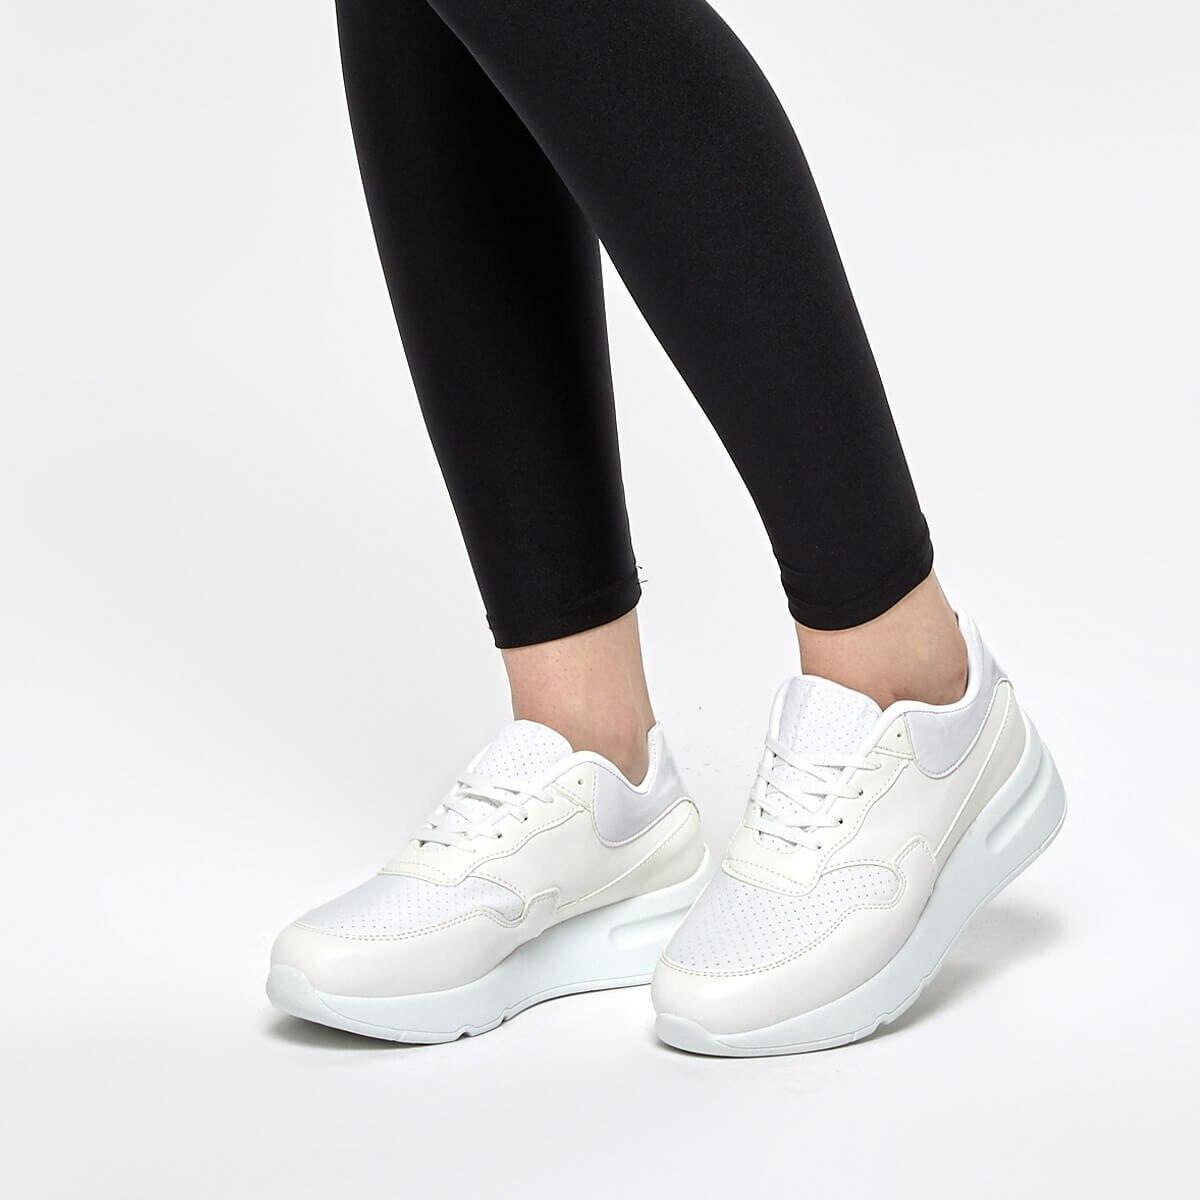 FLO GAİ01Z White Women 'S Sneaker Shoes BUTIGO